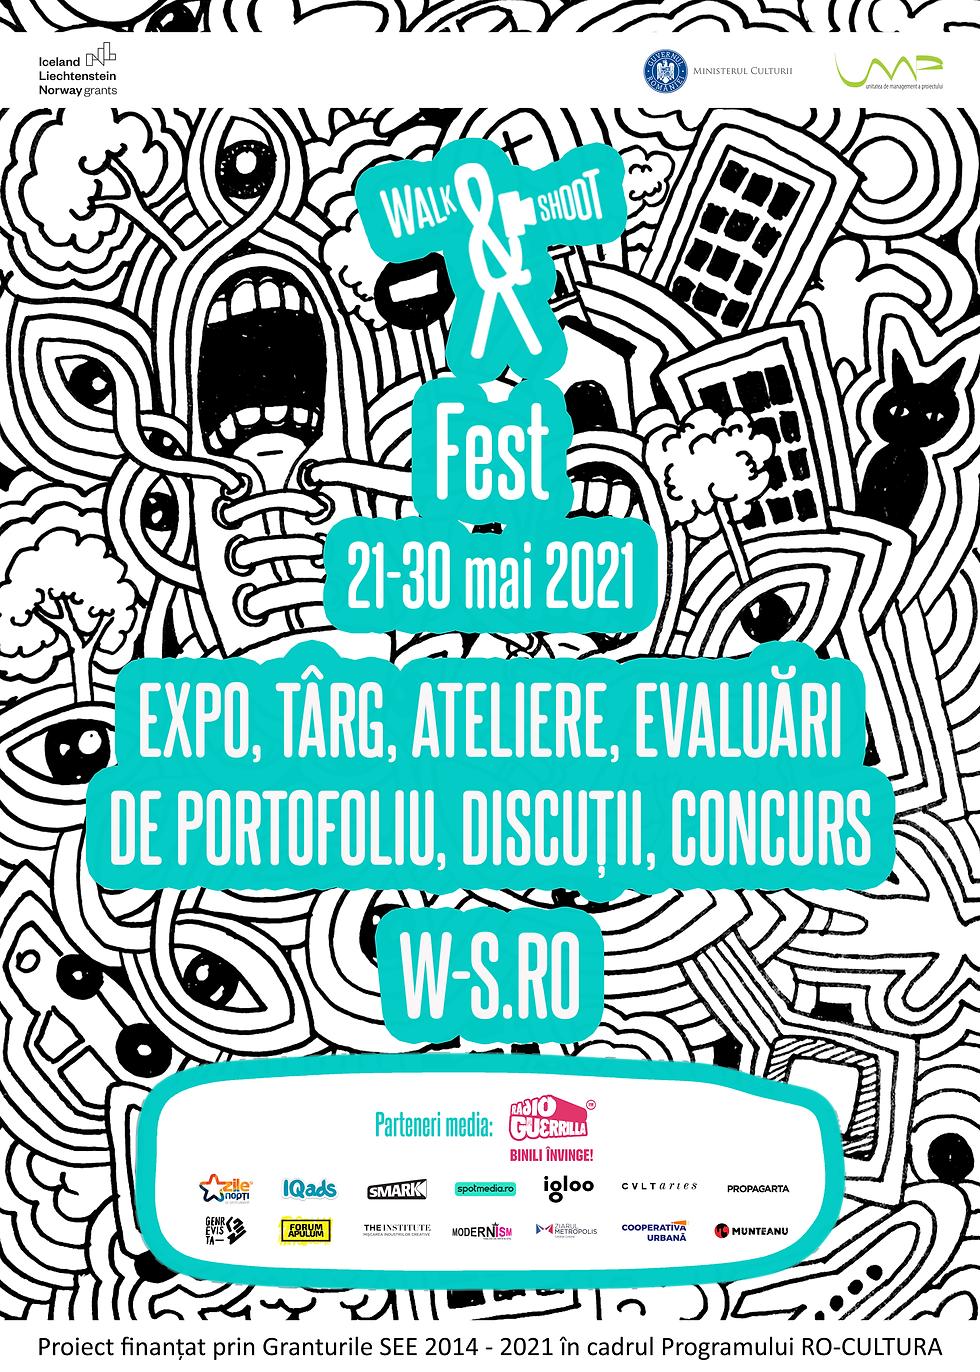 poster general festival.png